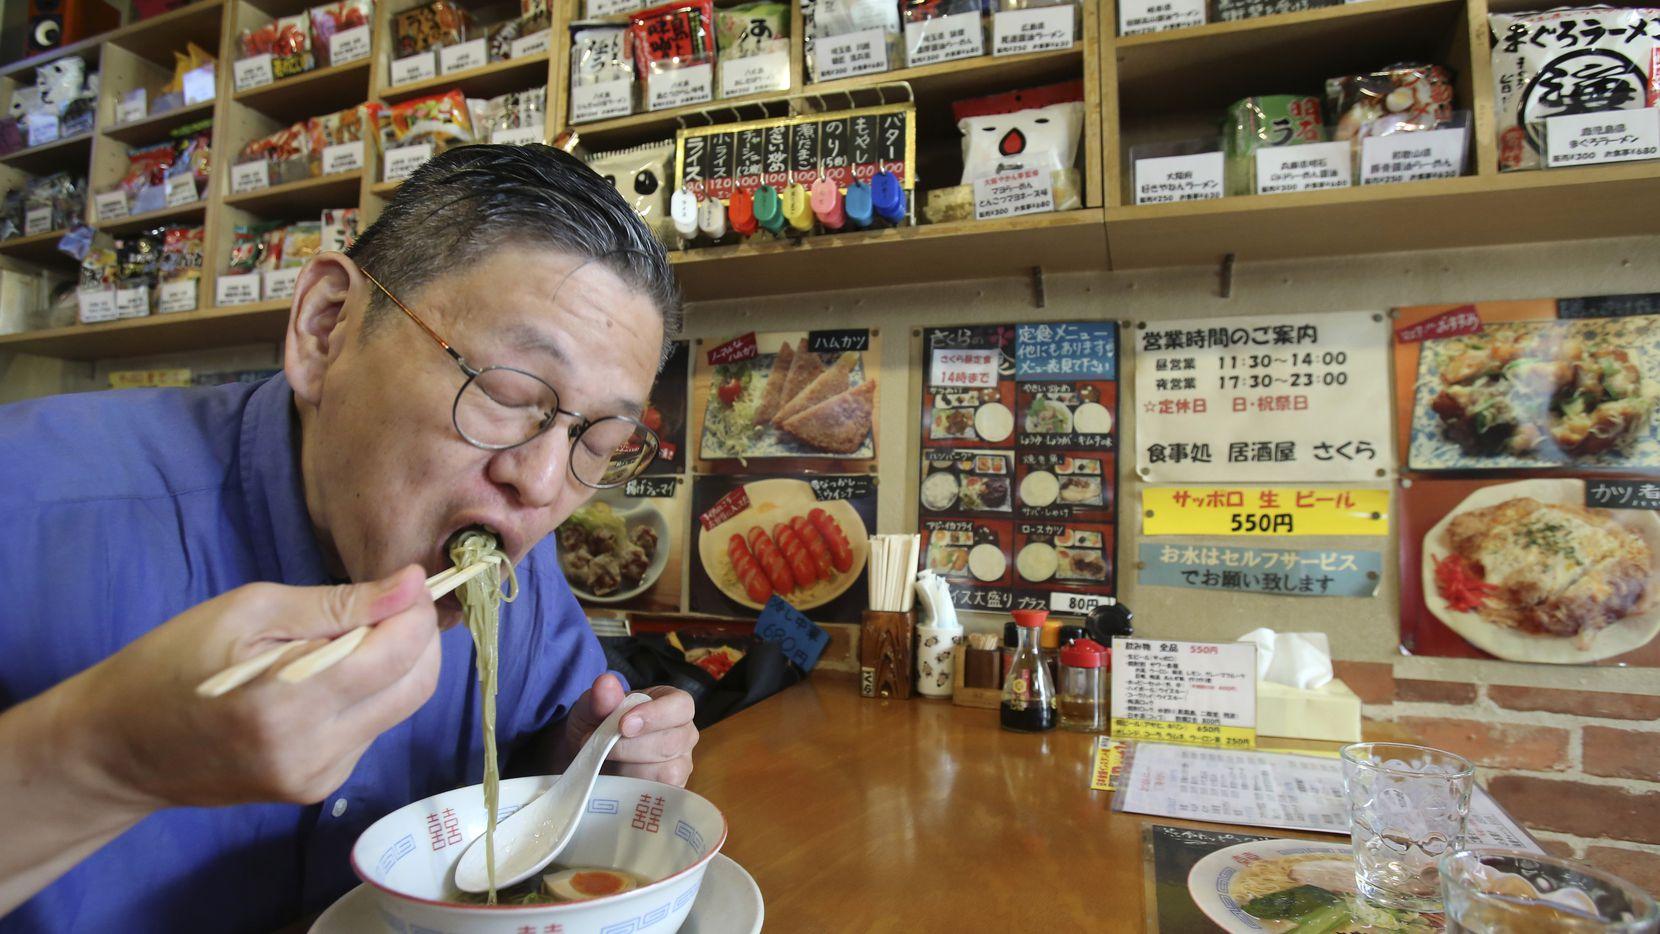 Masaya Sokusekisai Oyama, 55, slurps noodles at a Tokyo shop and restaurant specializing only in varieties of instant noodles.